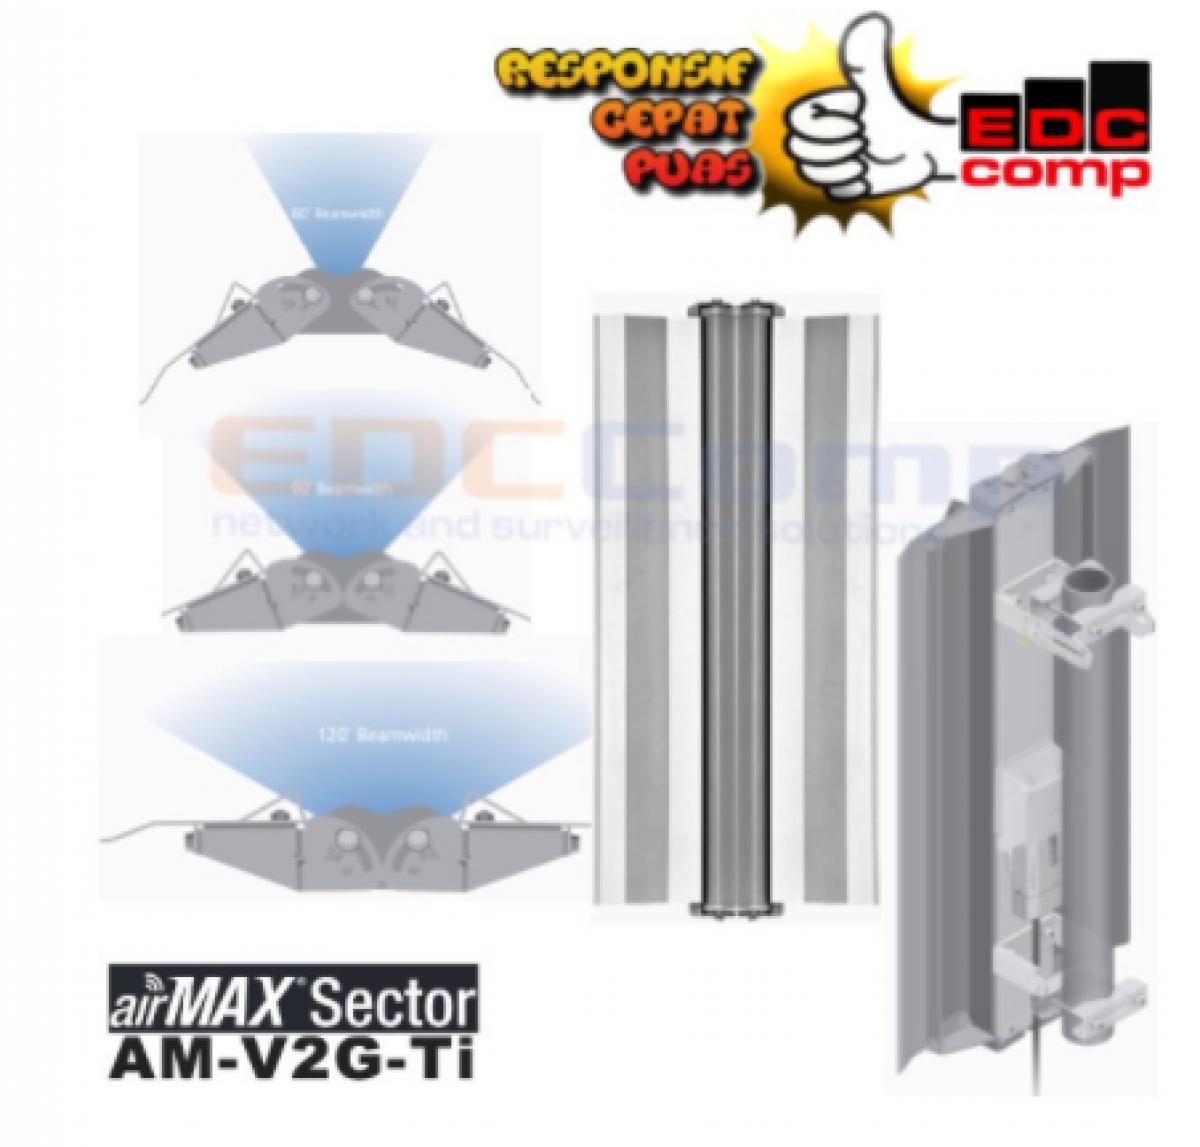 Ubiquiti Antenna Sectoral AM-V2G-Ti |Titanium Sector Antenna 2.4 - EdcComp